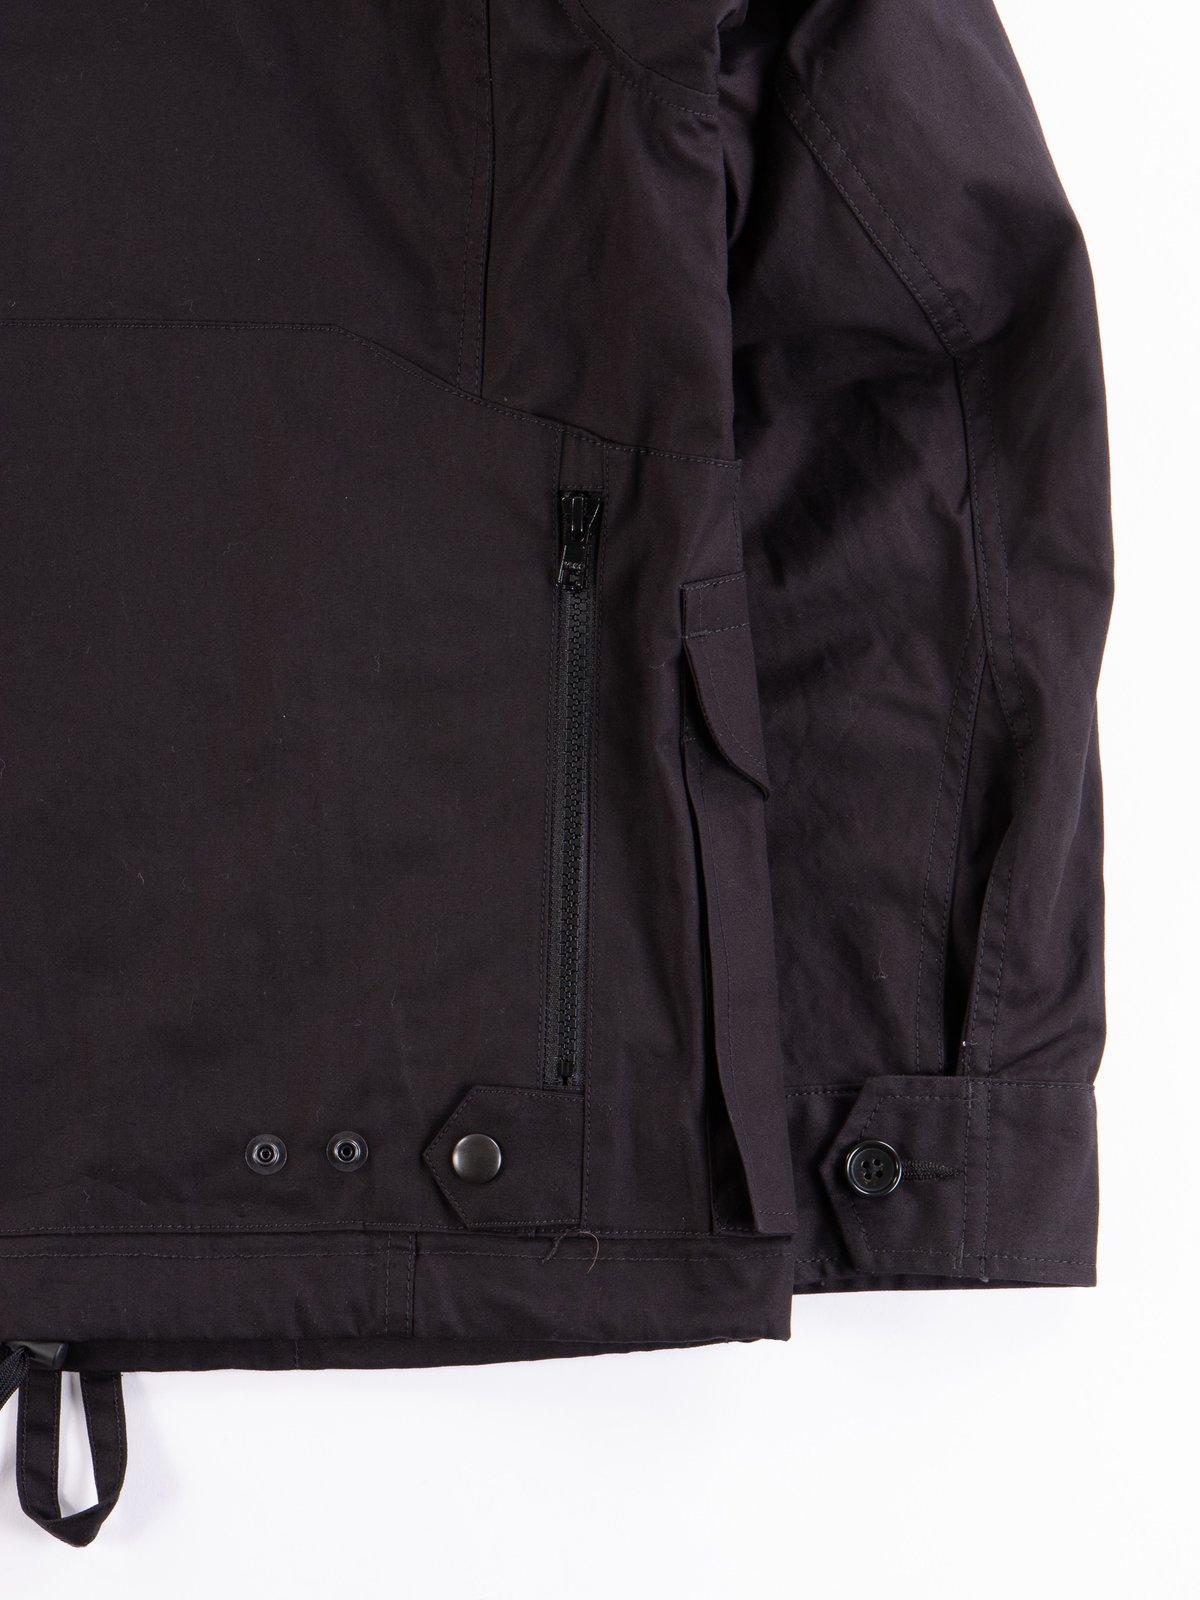 Deep Navy 10 Pockets Fishhunt Jacket - Image 7